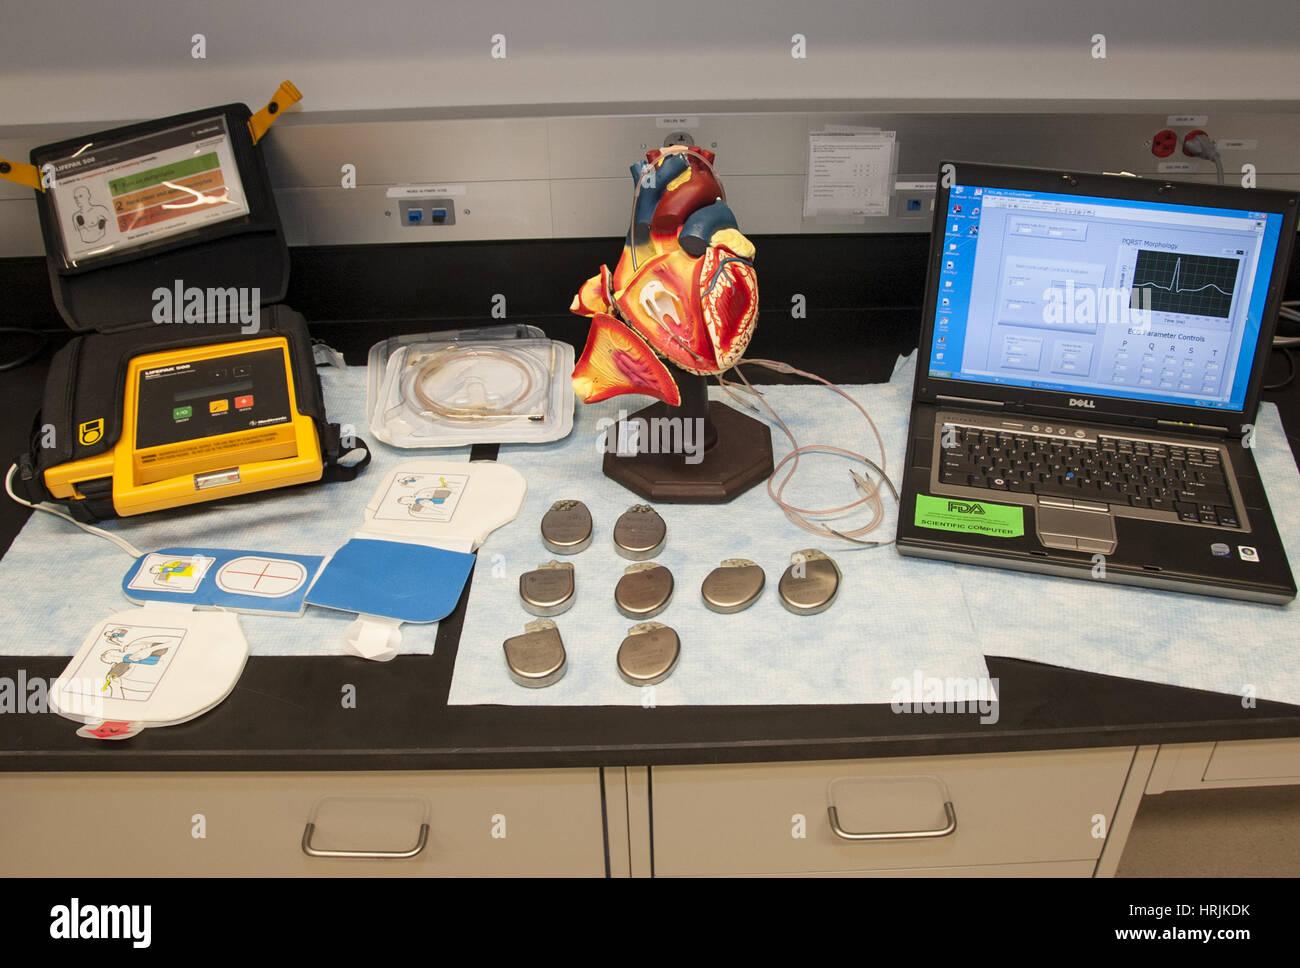 Defibrillator Research, 2015 - Stock Image